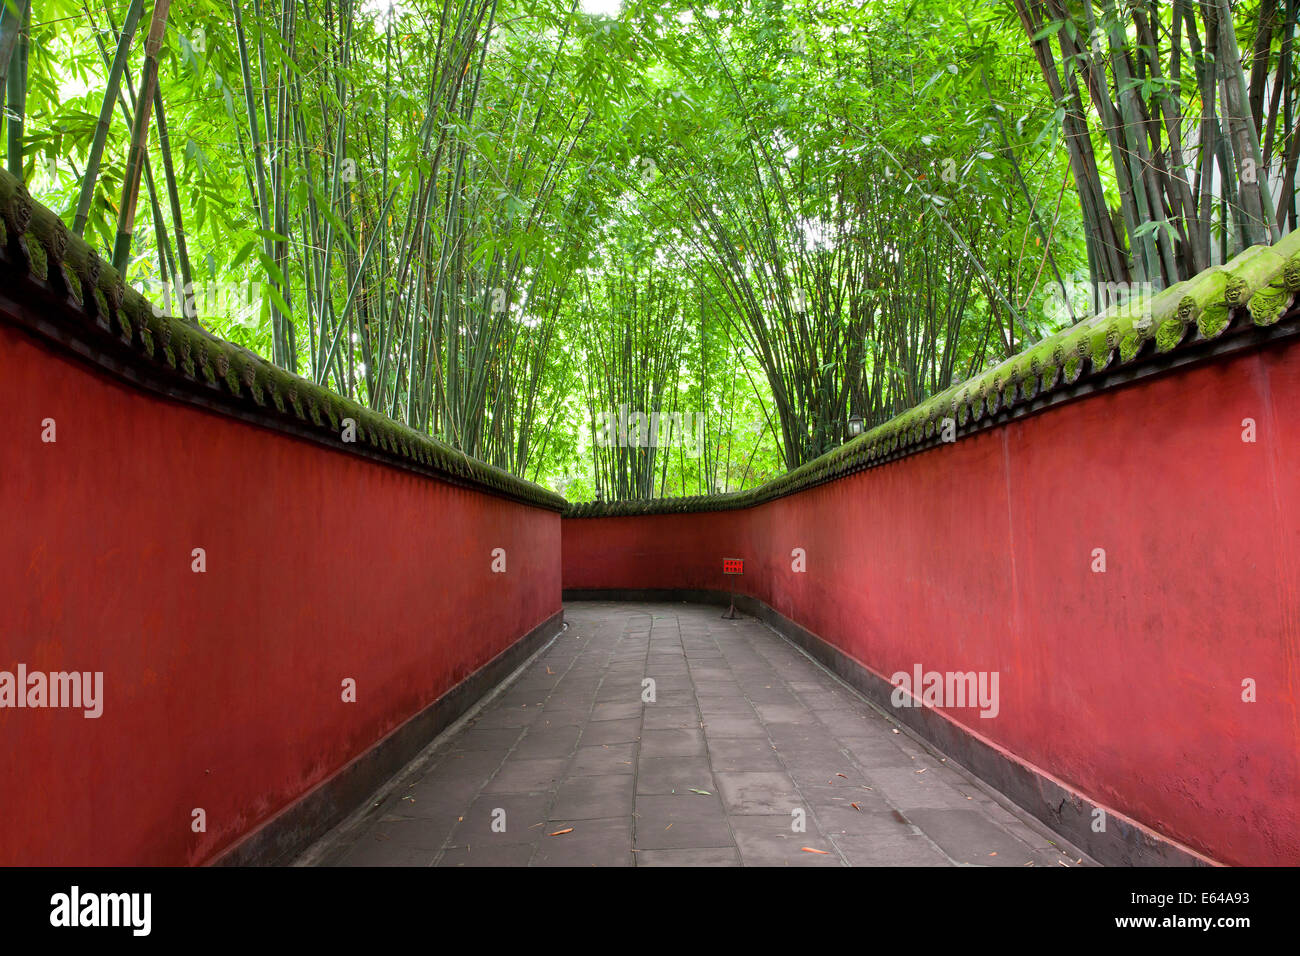 Gehweg mit Bambus Baldachin, Wuhou Schrein, Chengdu, Sichuan, China Stockbild